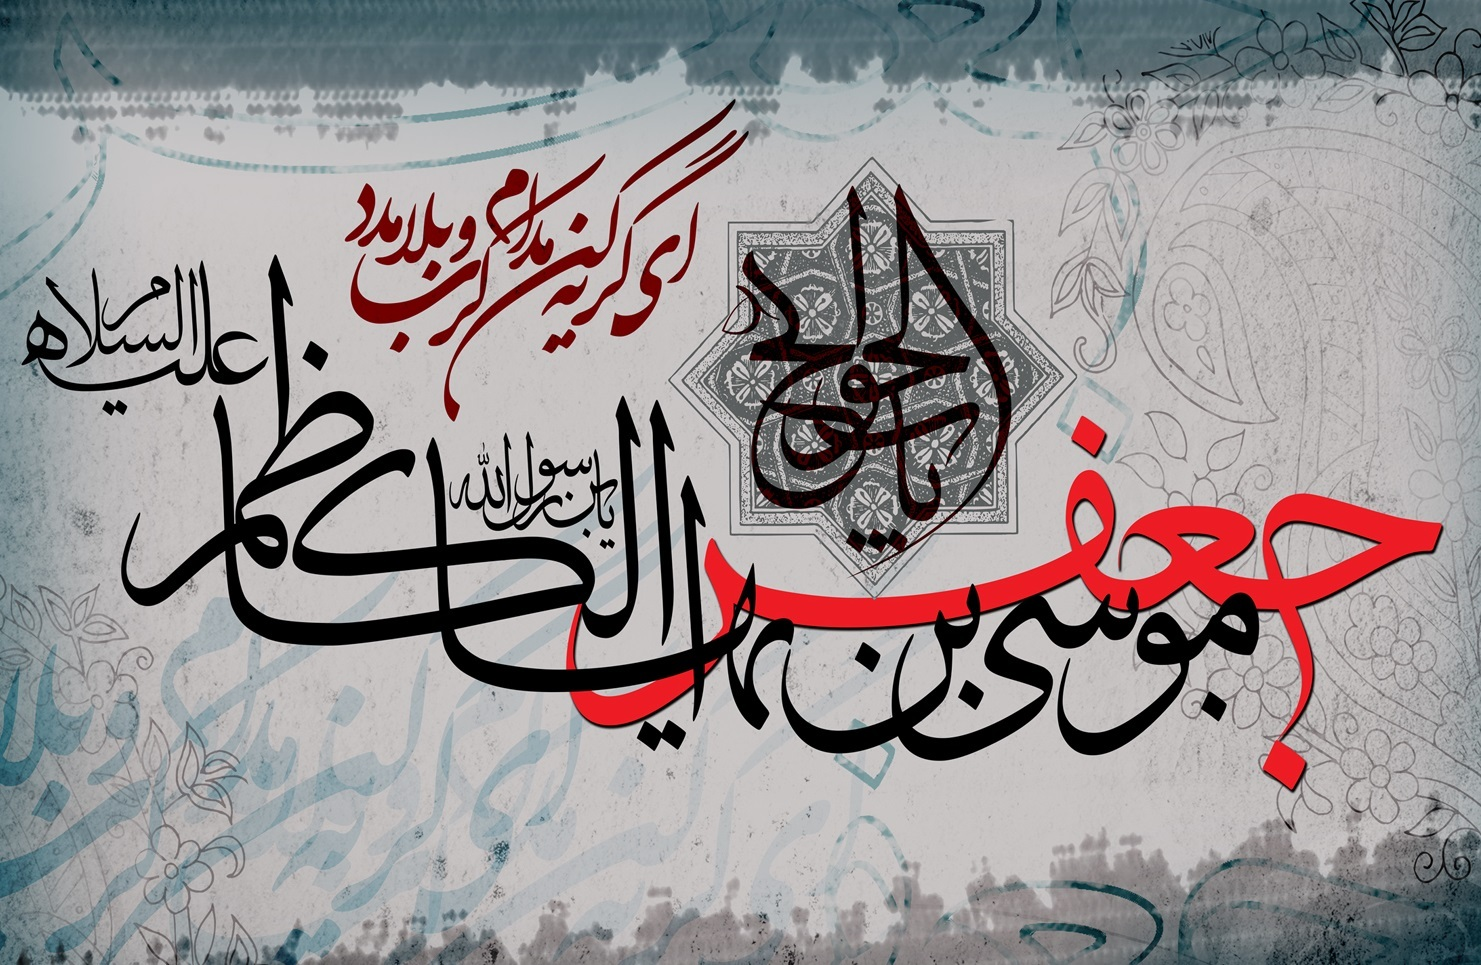 دانلود مداحی شهادت امام کاظم علیه السلام/ نریمان پناهی